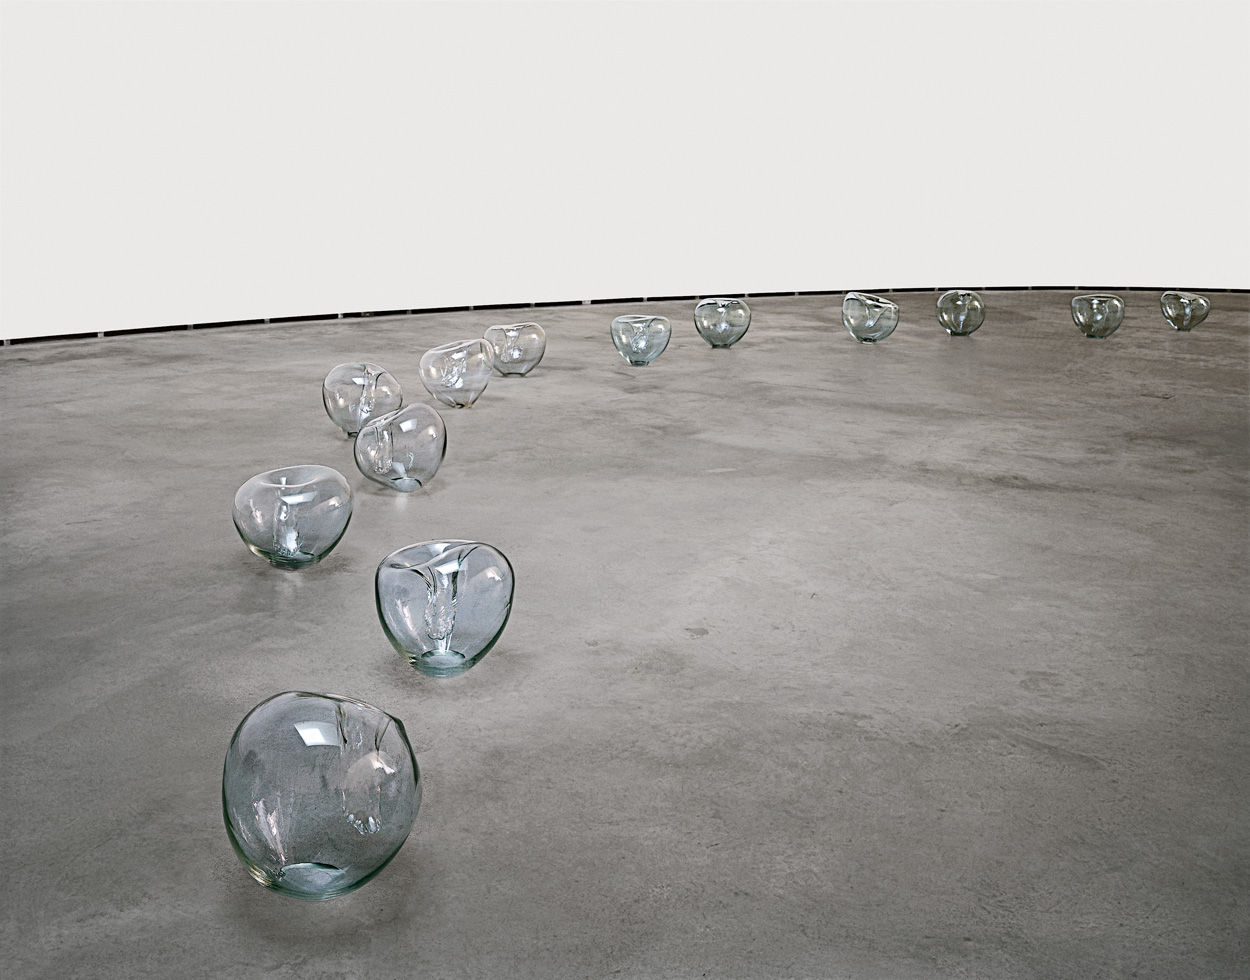 Levitas | Javier Pérez | Guggenheim Bilbao Museoa